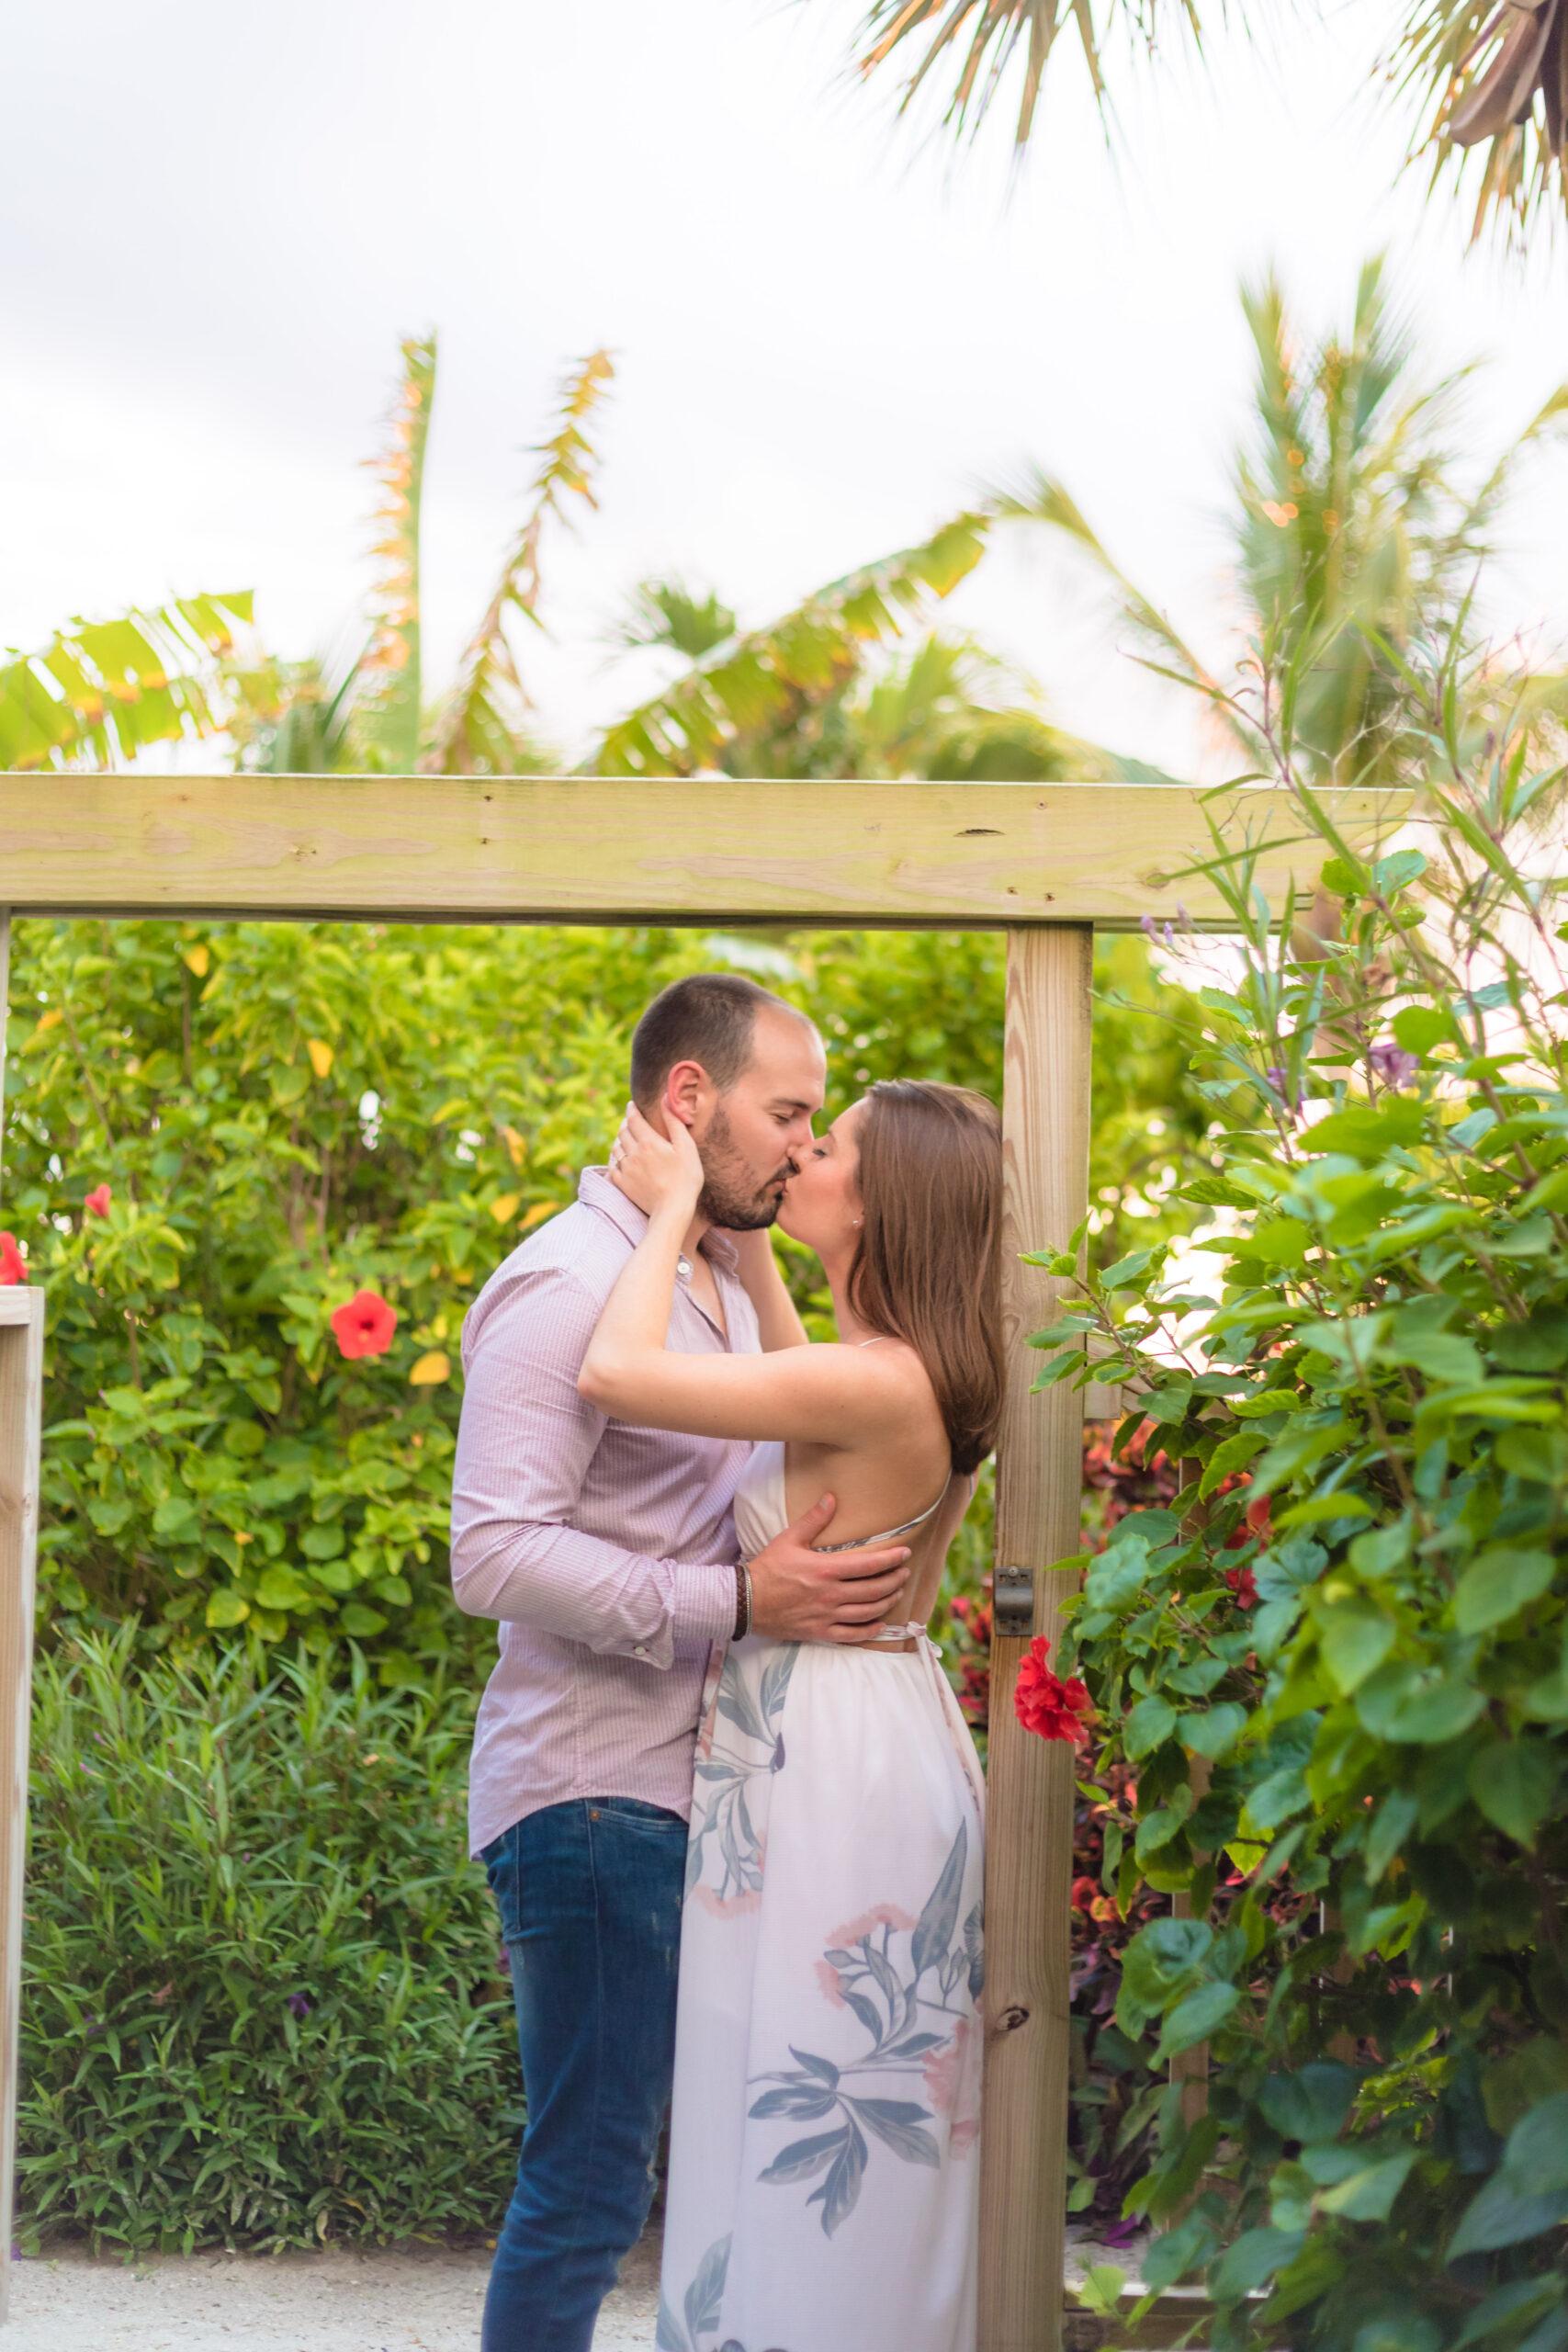 engagement portrait session for a wedding